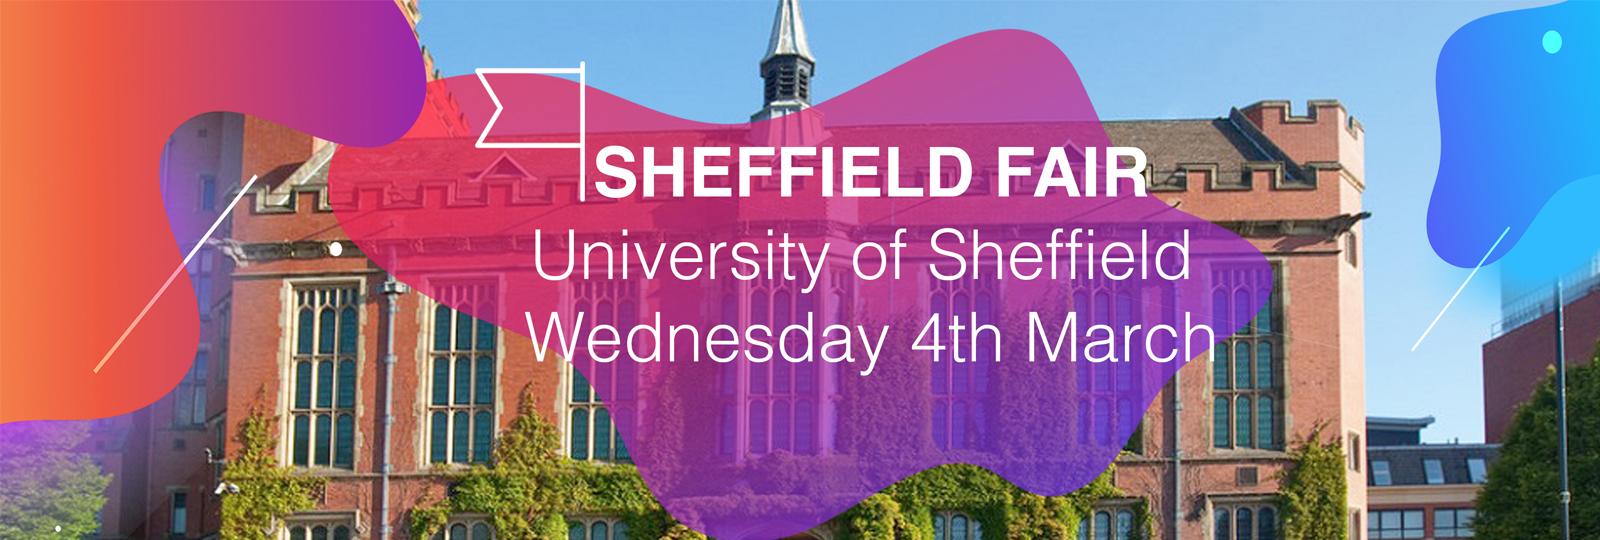 University of Sheffield Spring 2020 Fair